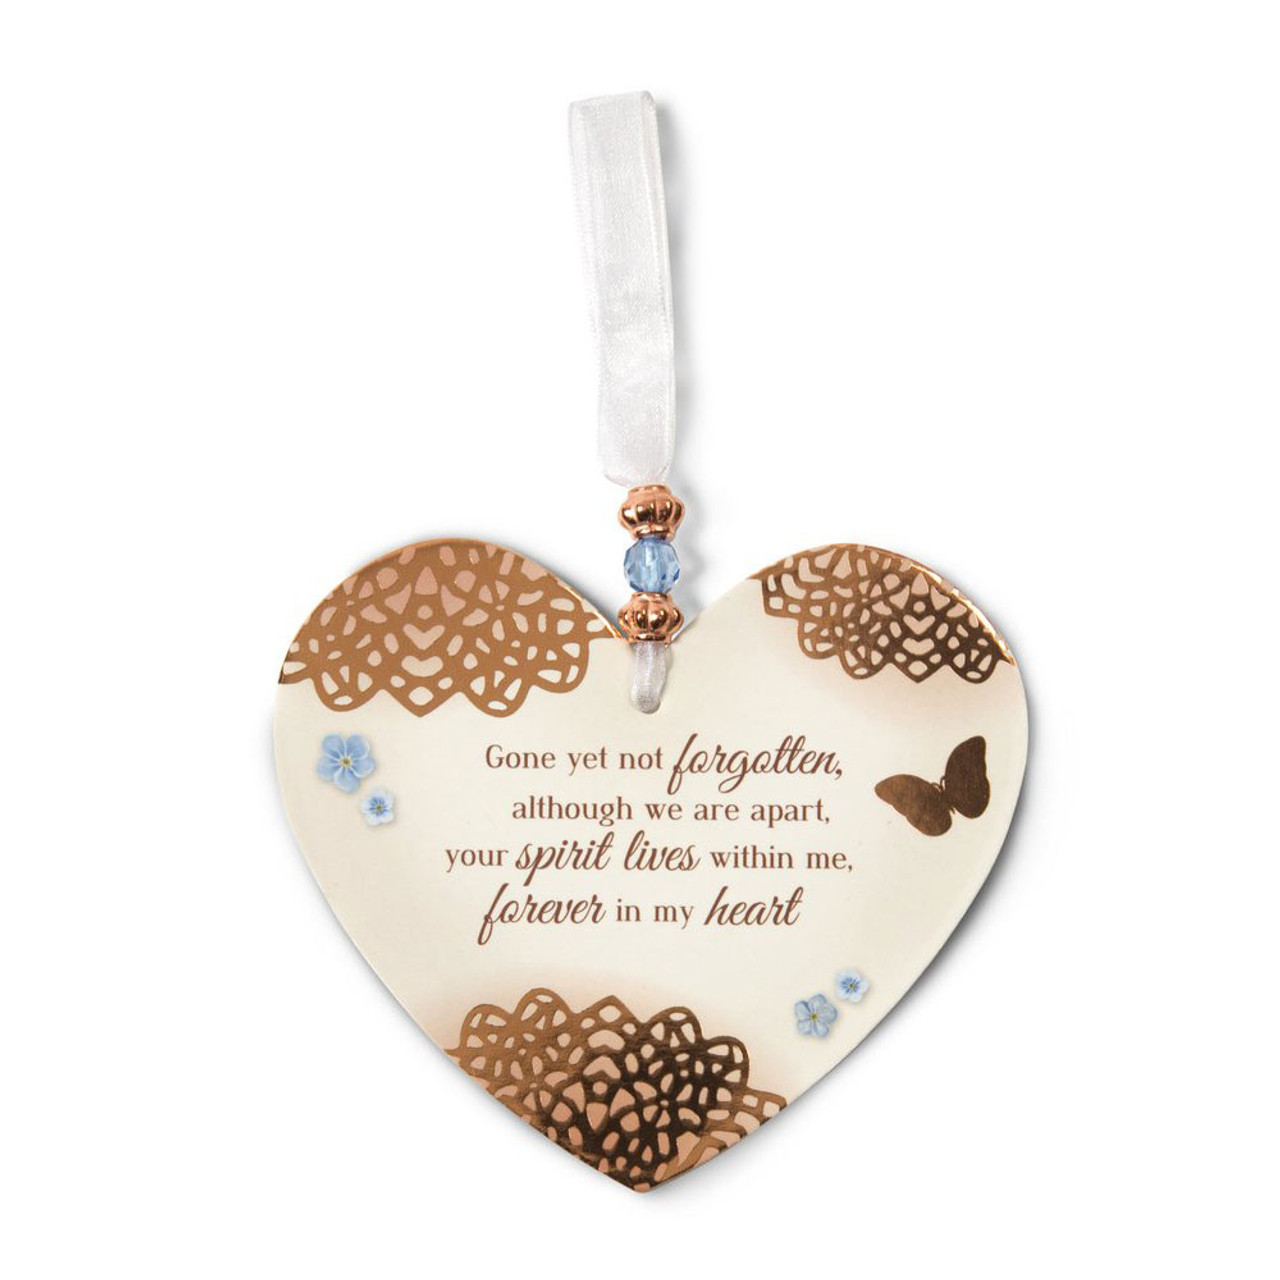 Memorial Heart Ornament